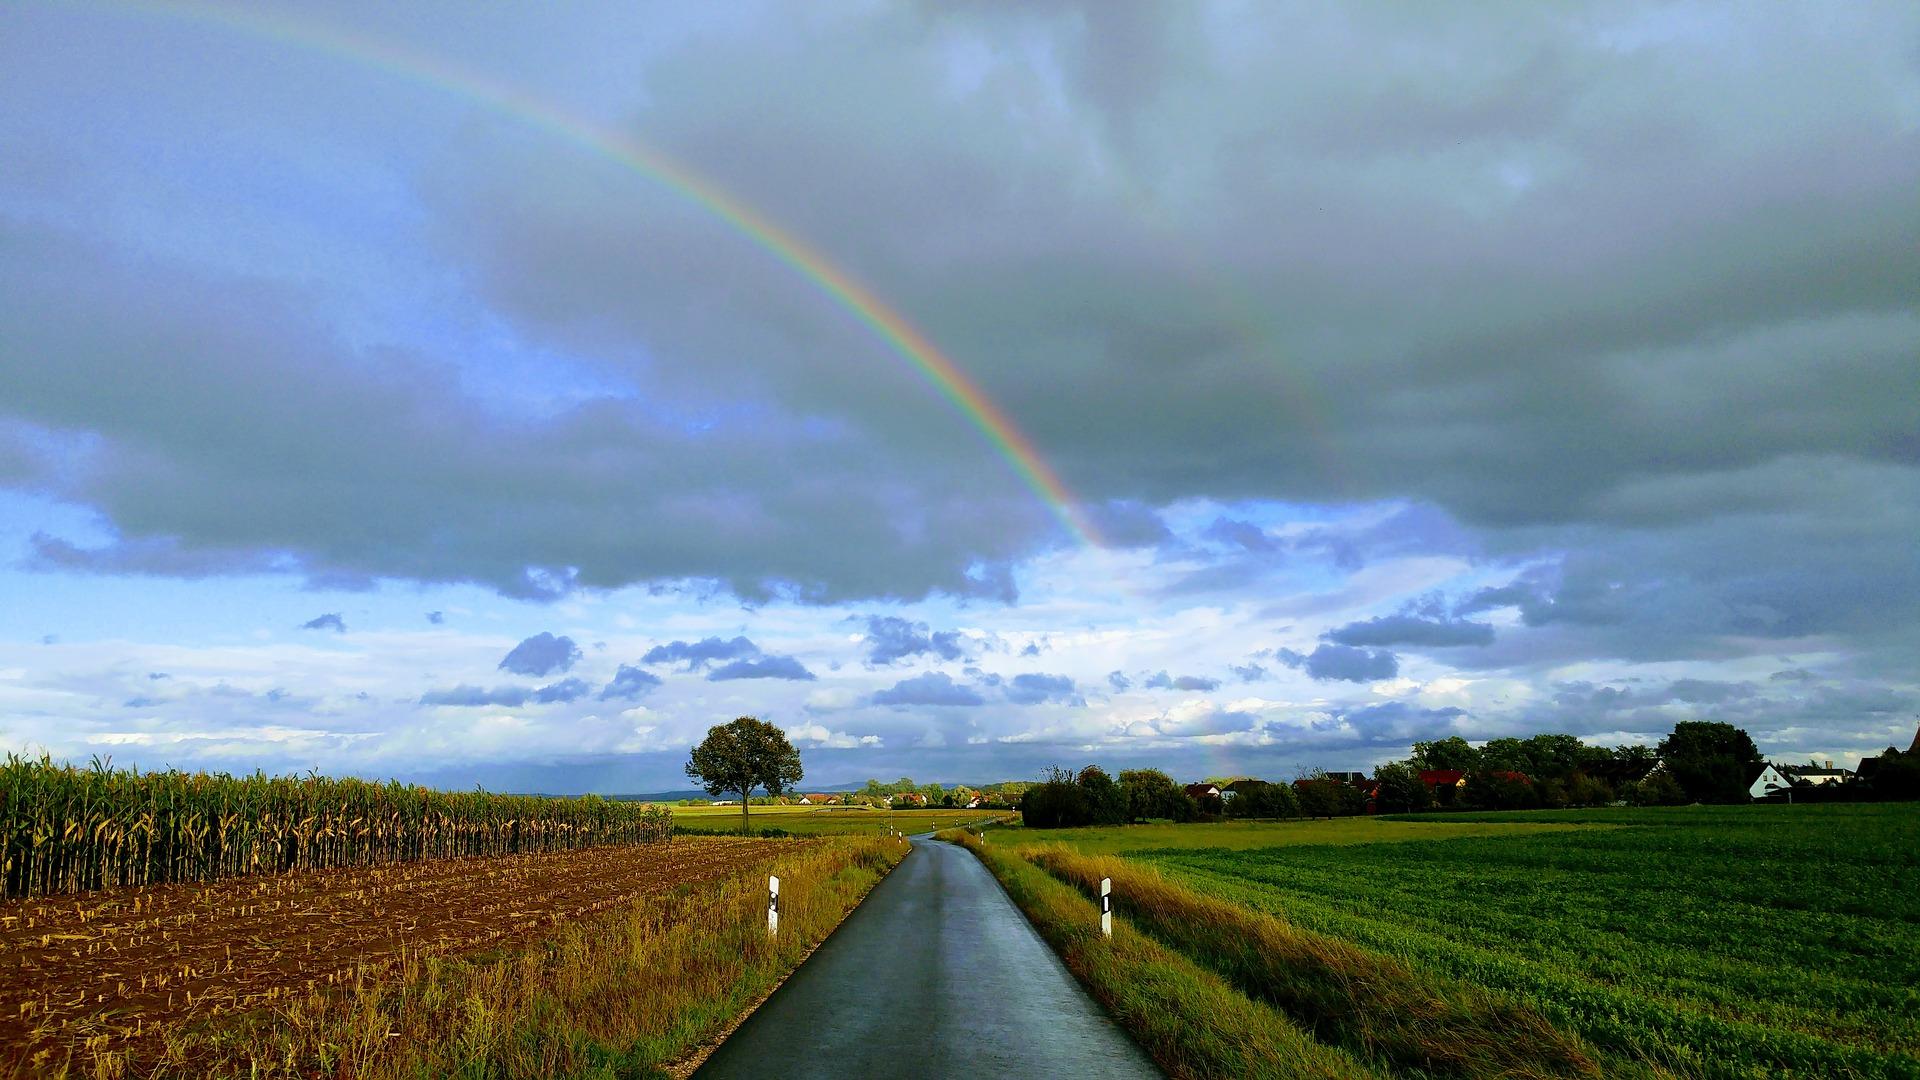 rainbow-2891221_1920